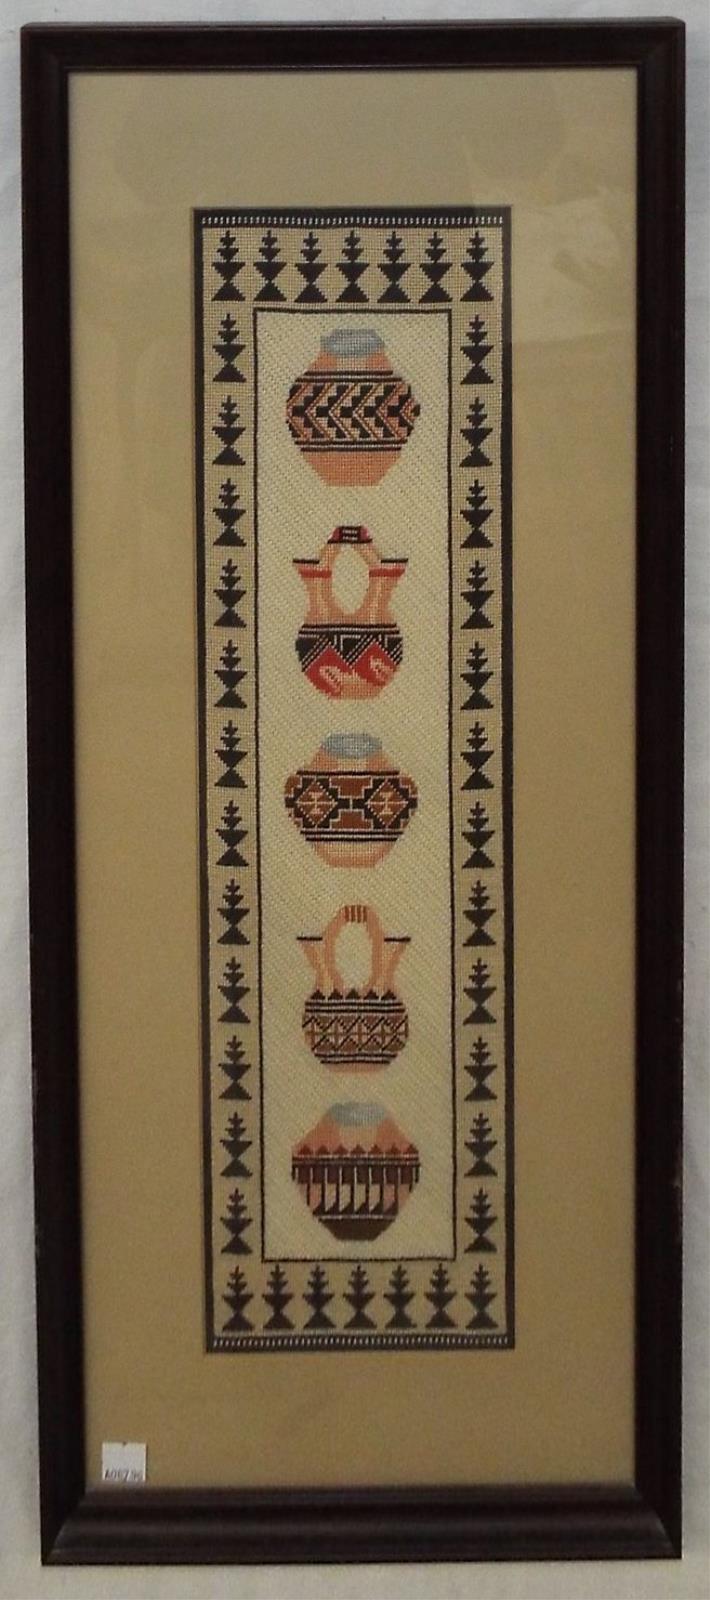 Framed Needlework Of Southwest Pottery Jars